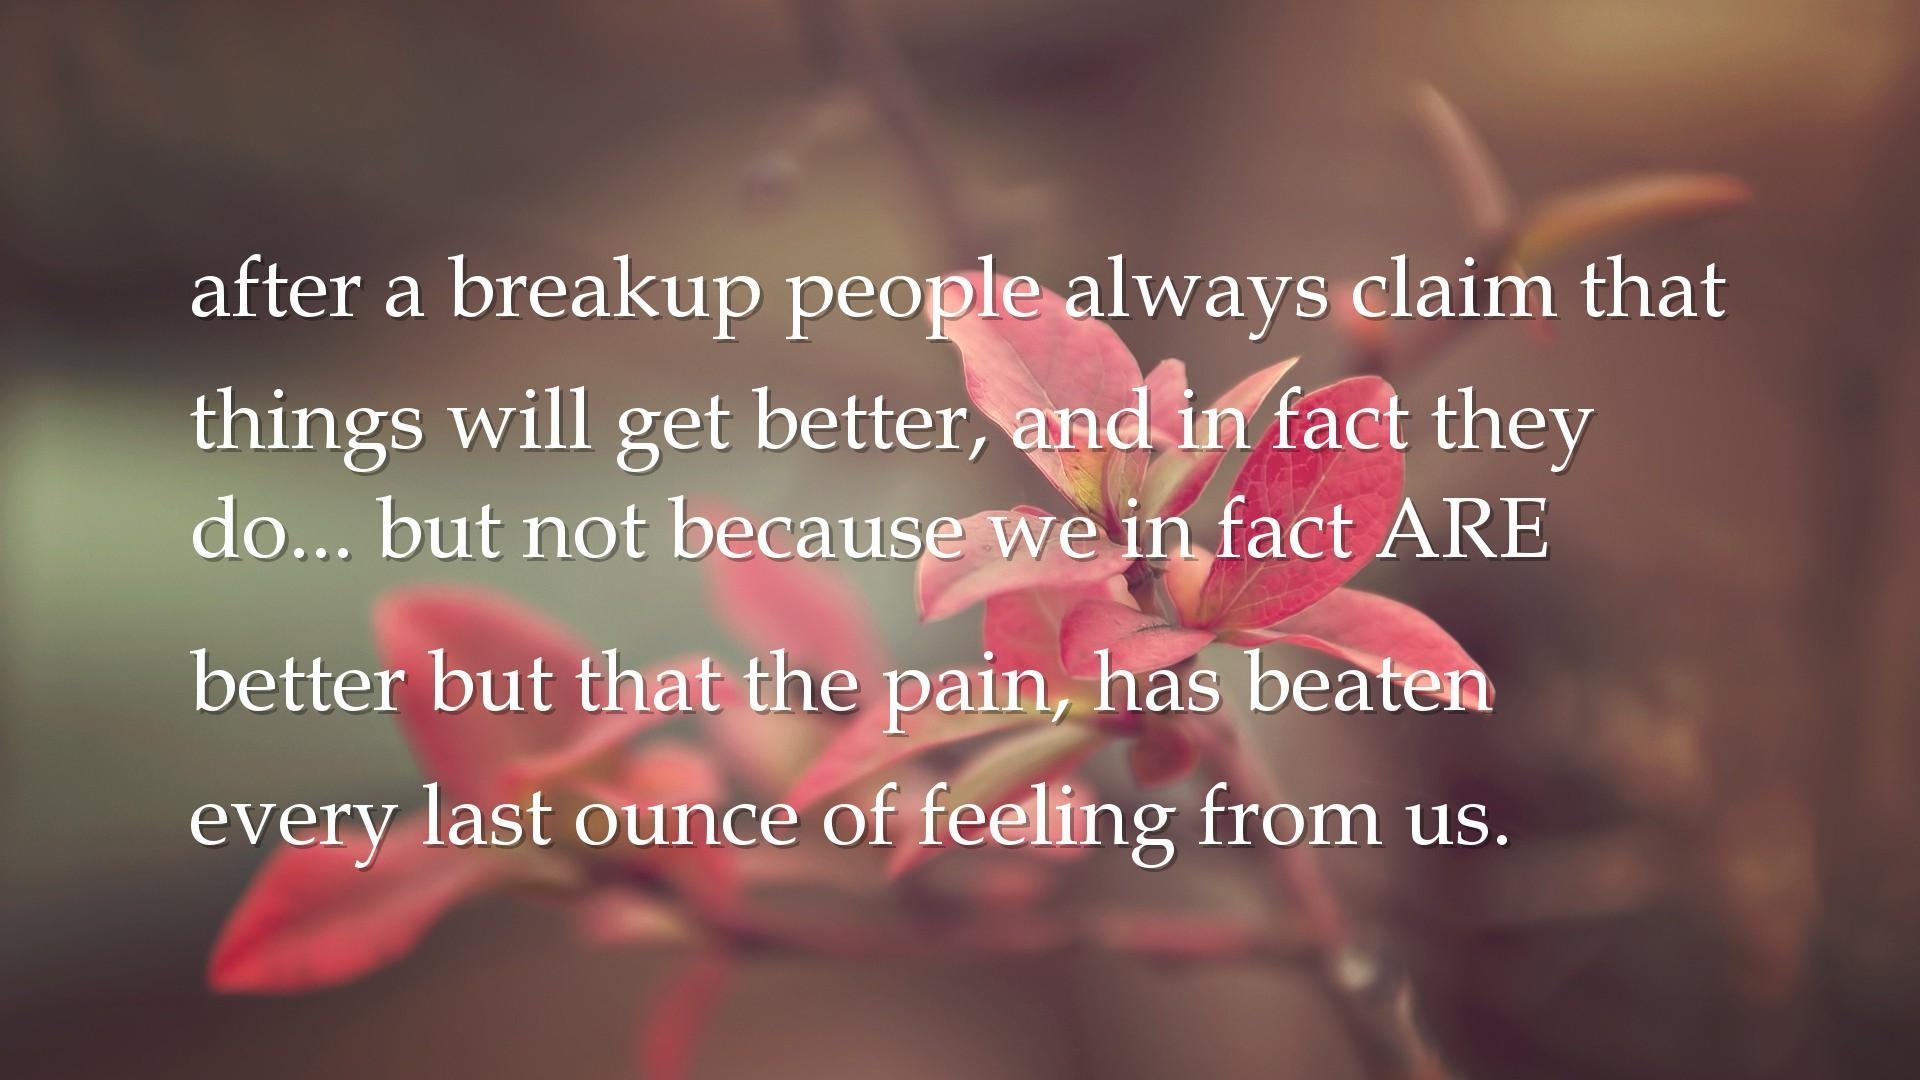 Comfort Friend After Break Up Quotes : Comforting quotes break up quotesgram